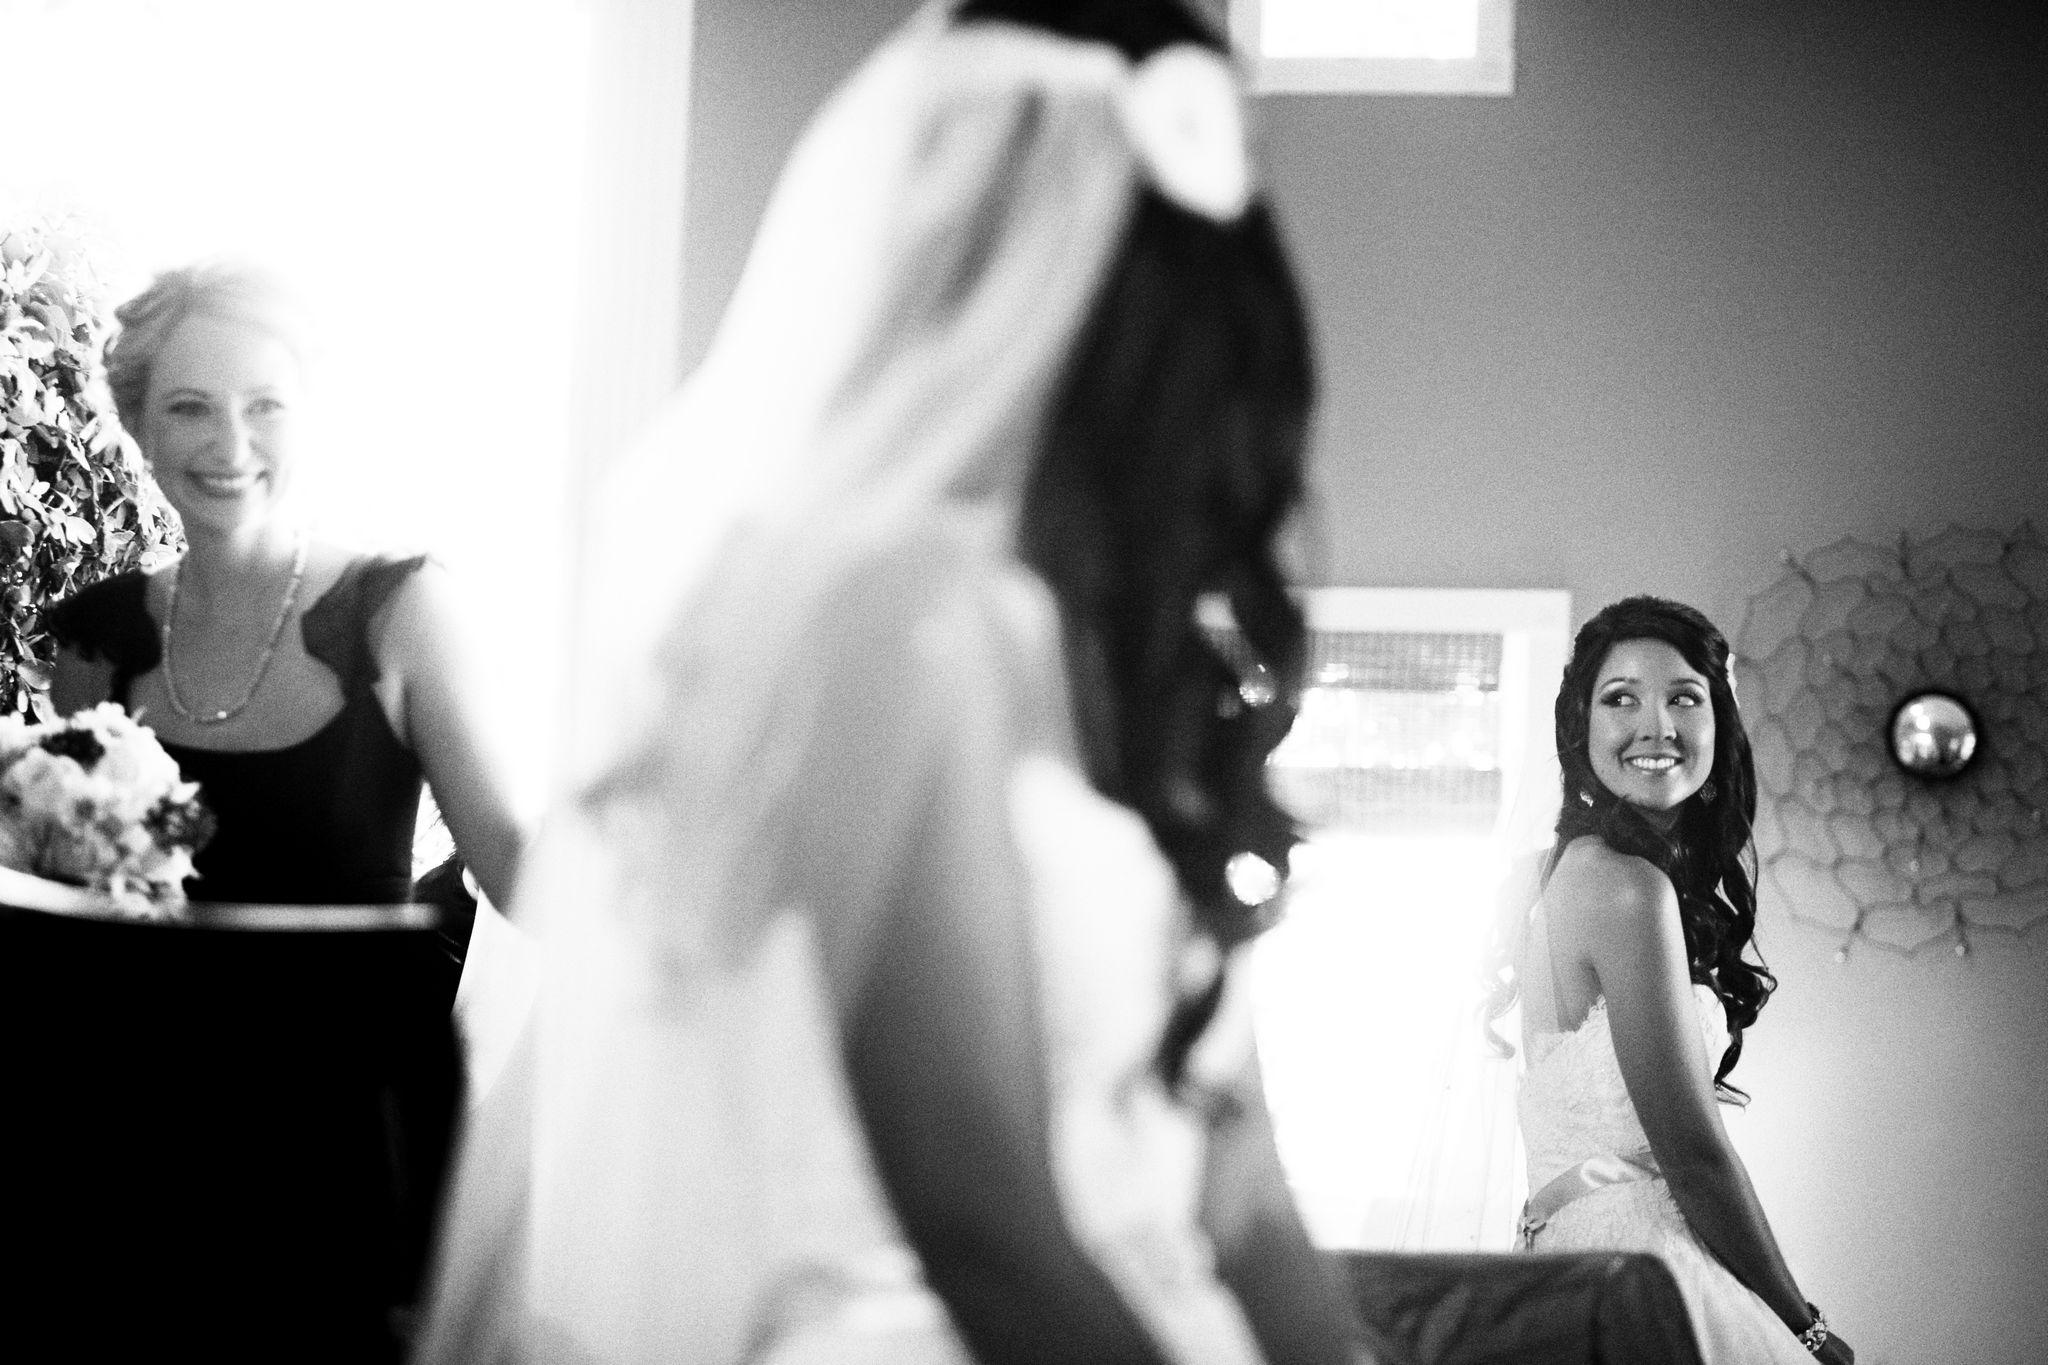 wedding-moments-anticipating-a-shot-cctj_p045.jpg